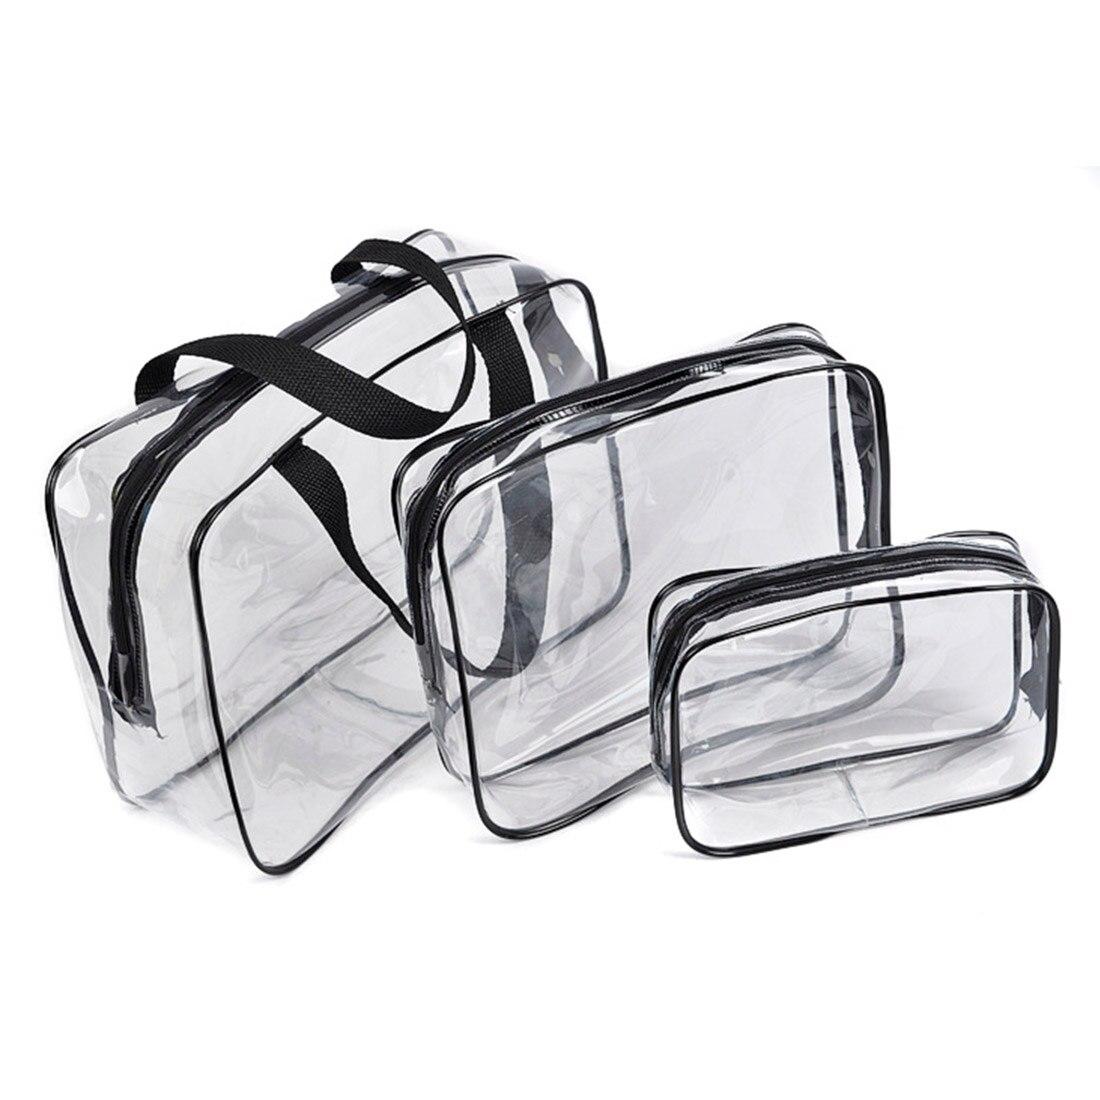 Portable Clear Travel Cosmetic Makeup Organizer Bag Transparent Storage Bags Functional Bag Pencil Case Portable Makeup Bag